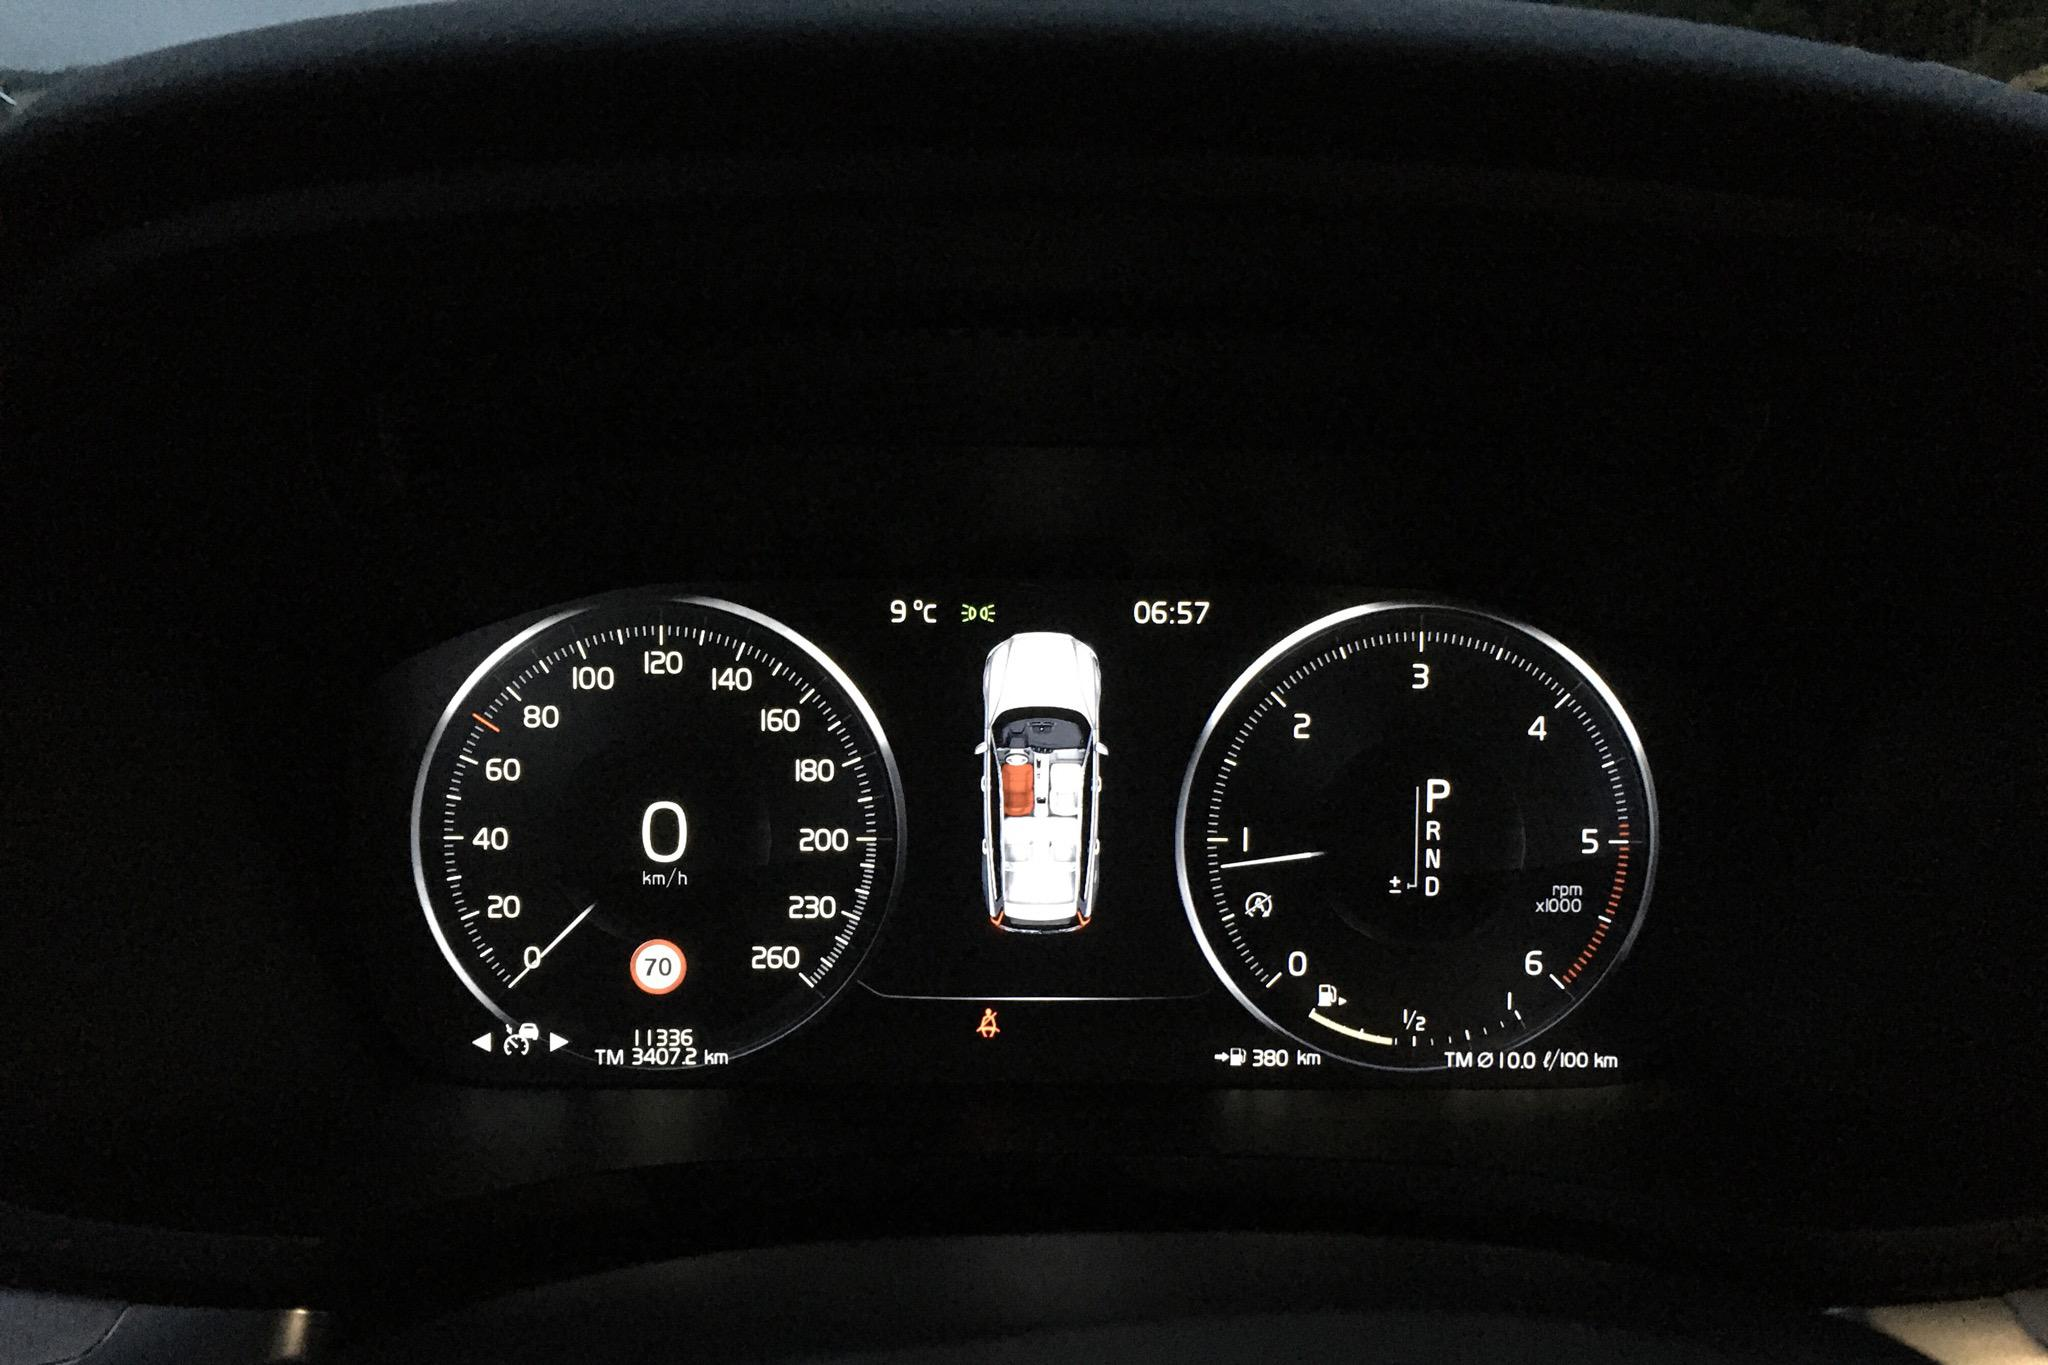 Volvo V60 D4 Cross Country AWD (190hk) - 11 330 km - Automatic - white - 2020